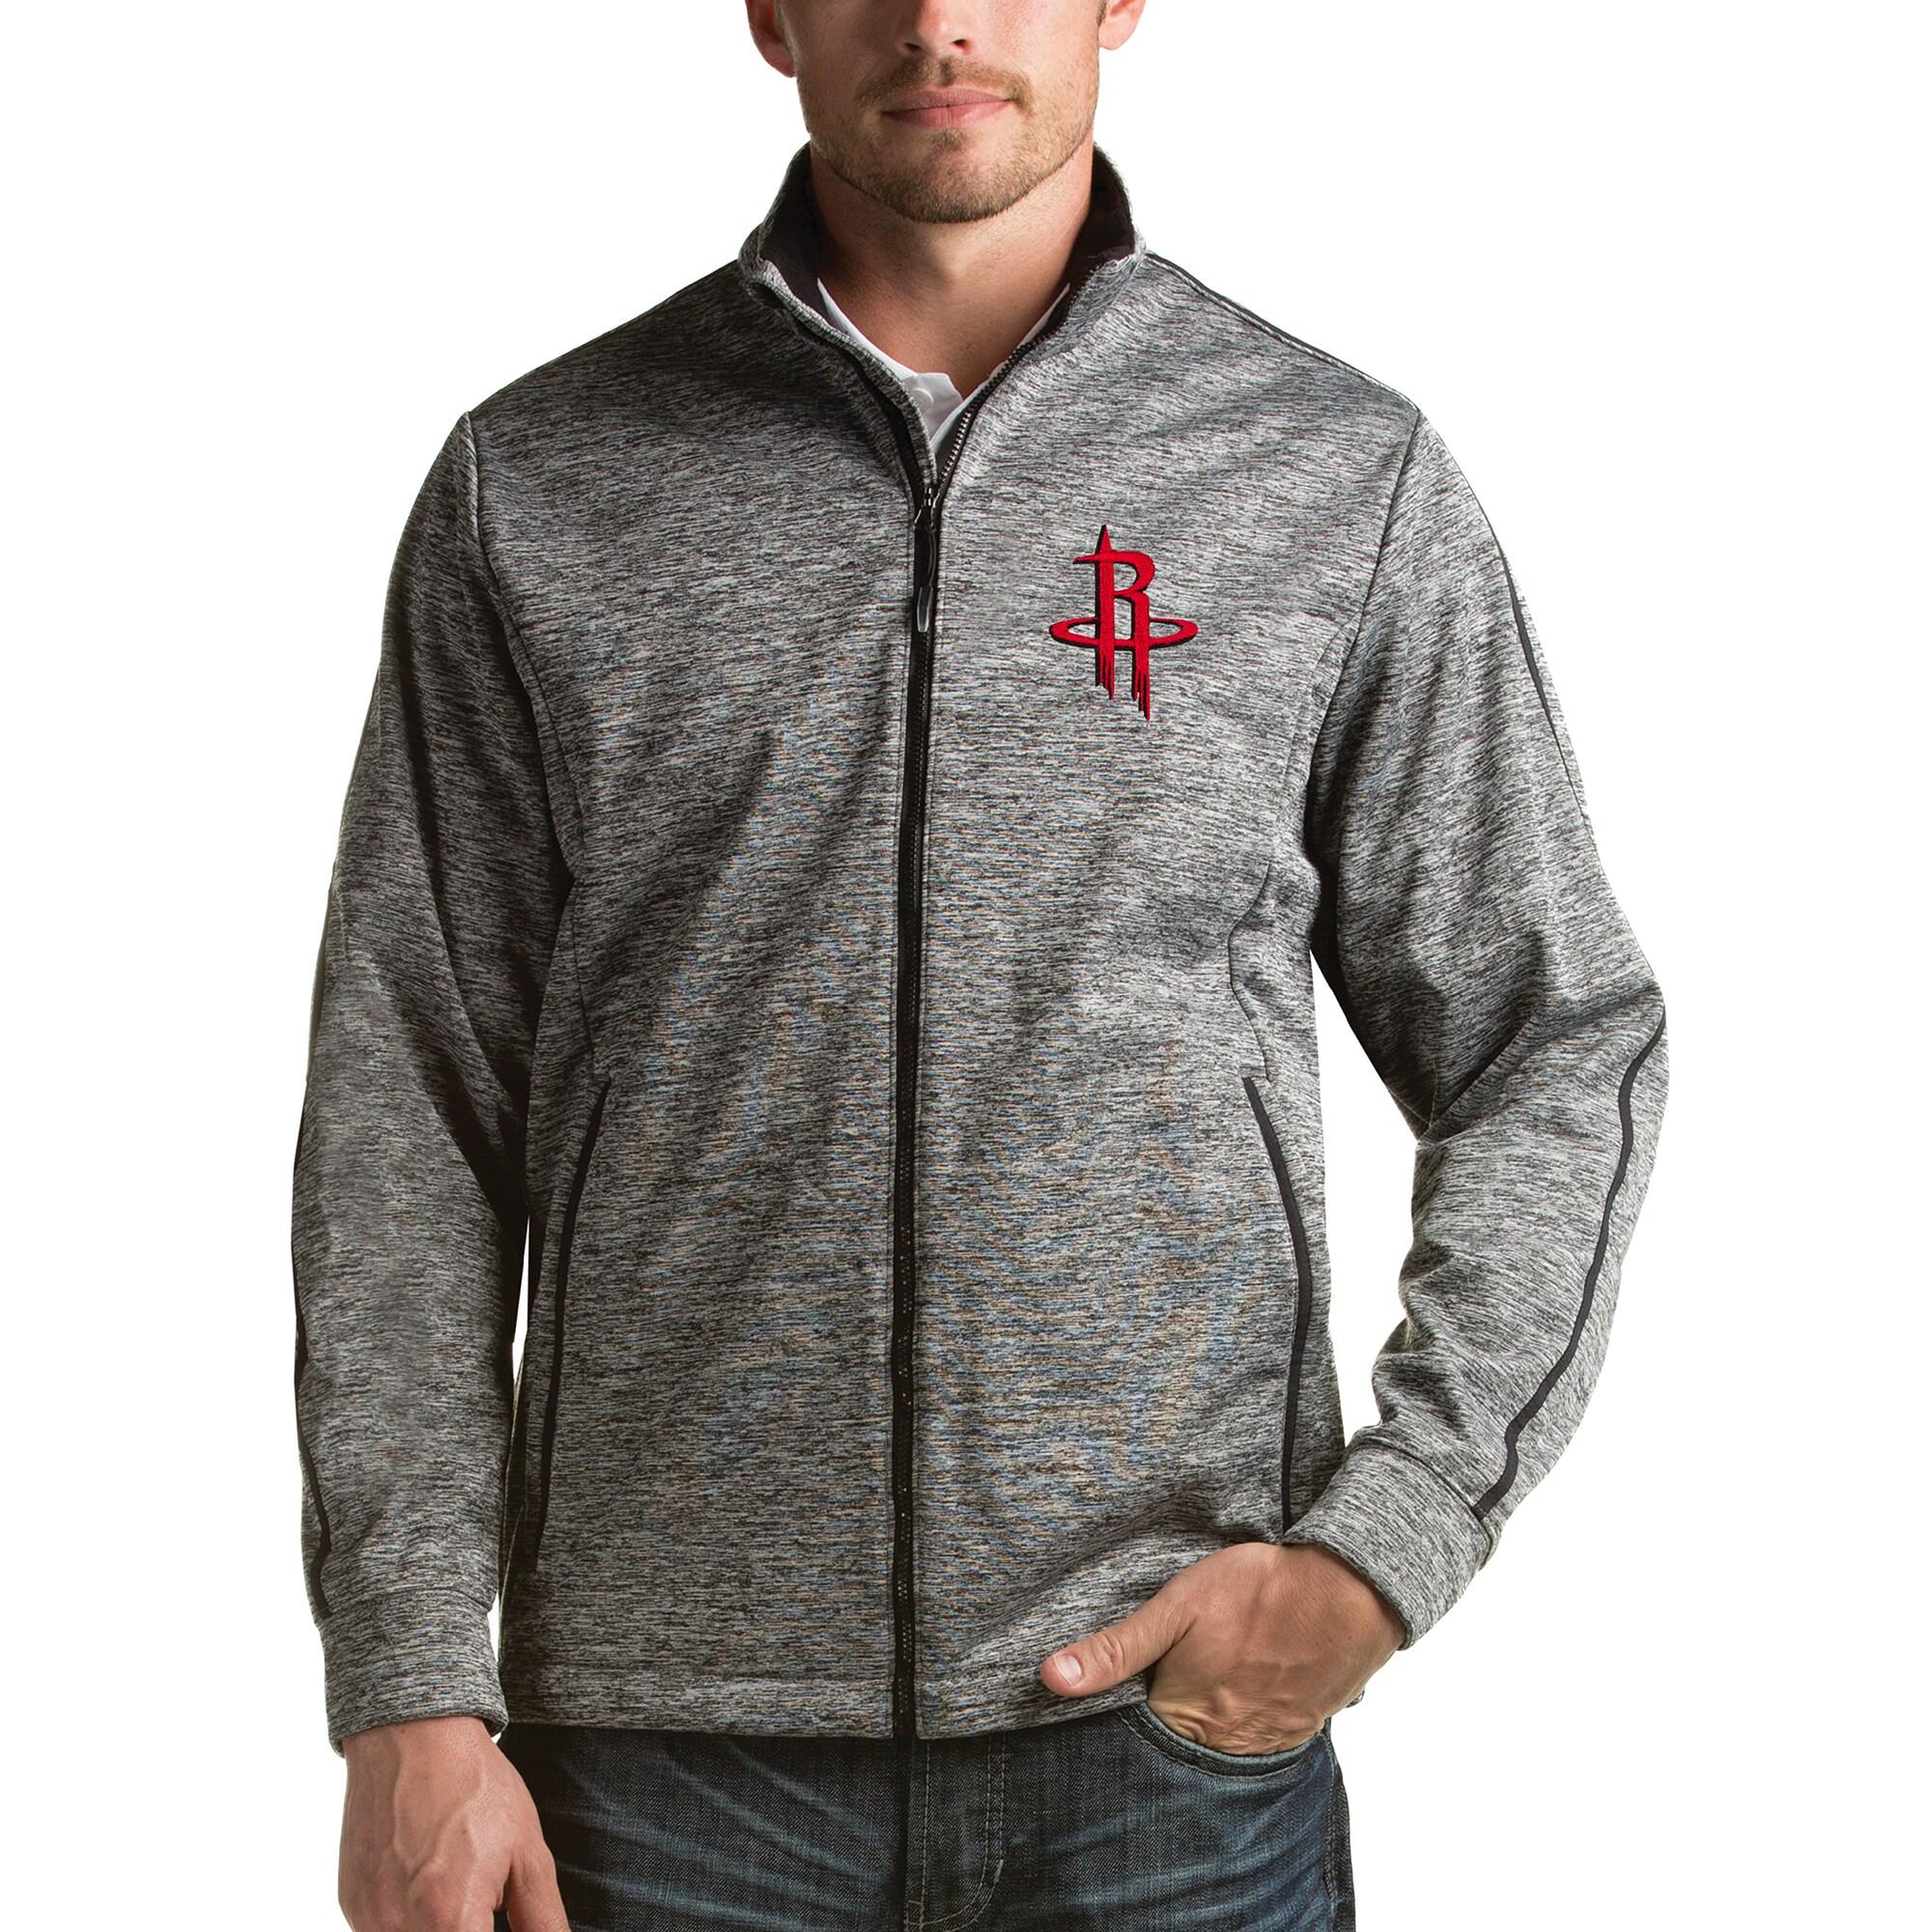 Houston Rockets Antigua Golf Full Zip Jacket - Heathered Black